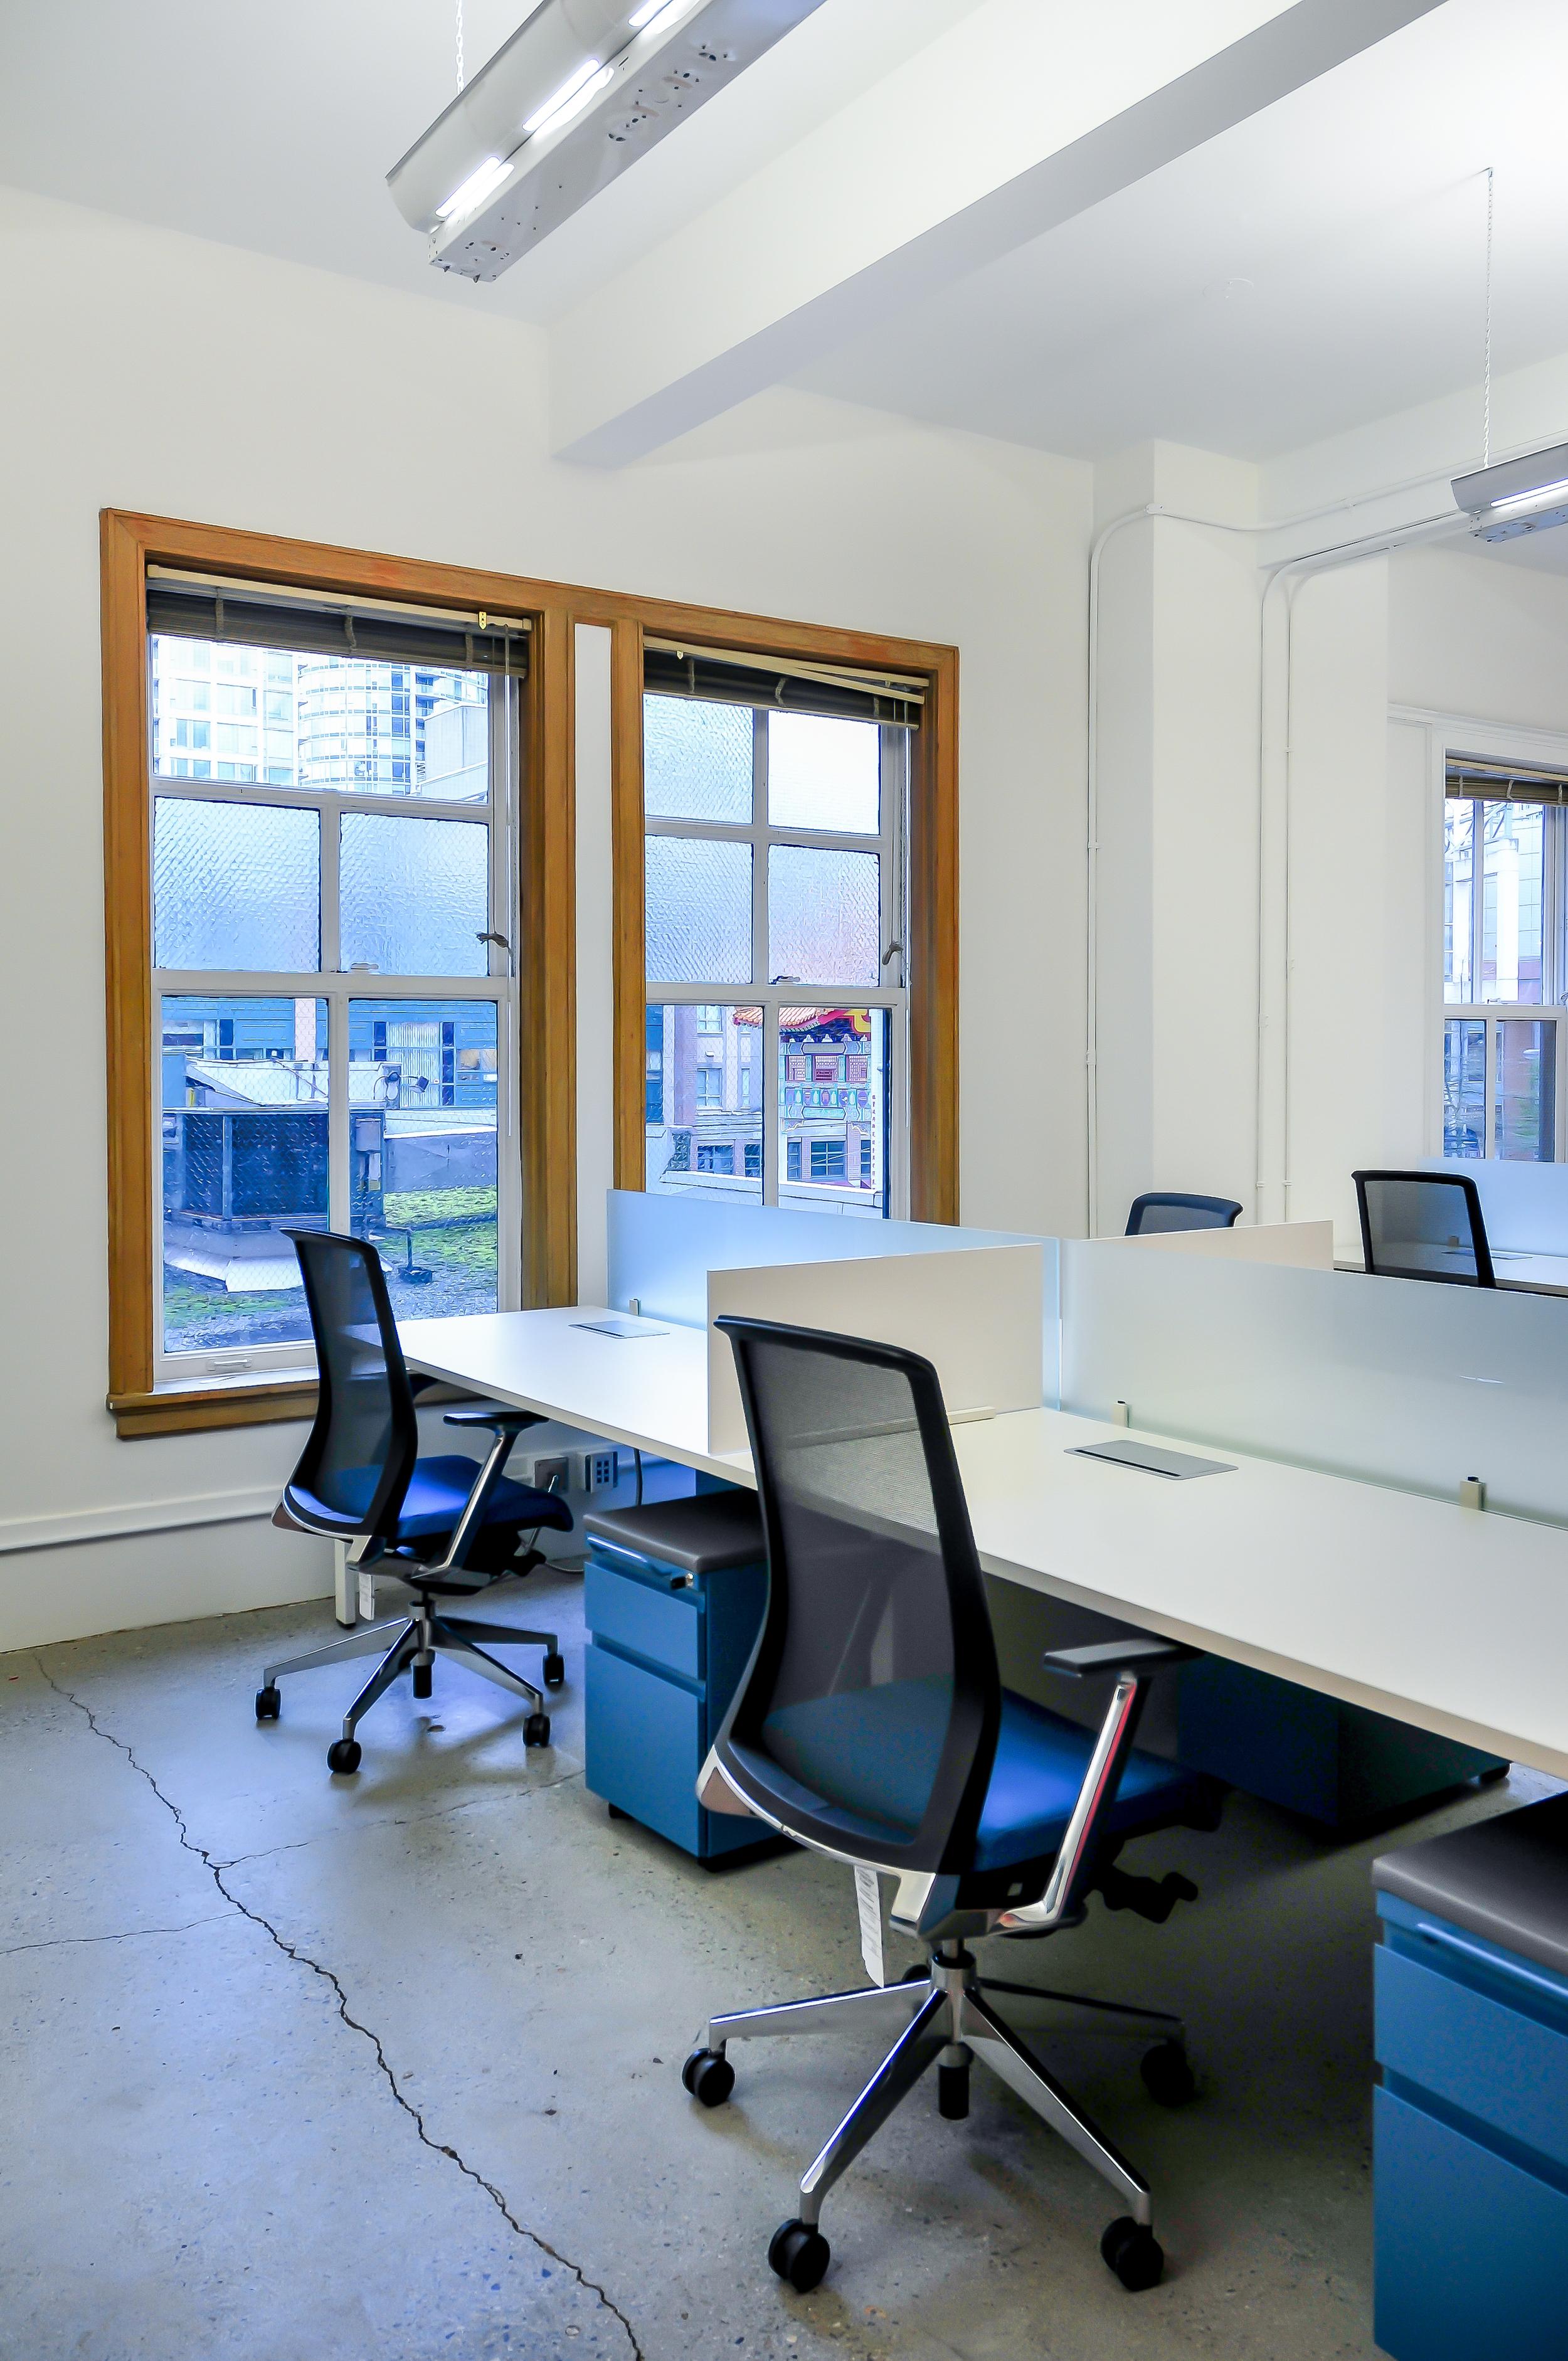 20140423-Gastown Office (7 of 21).jpg